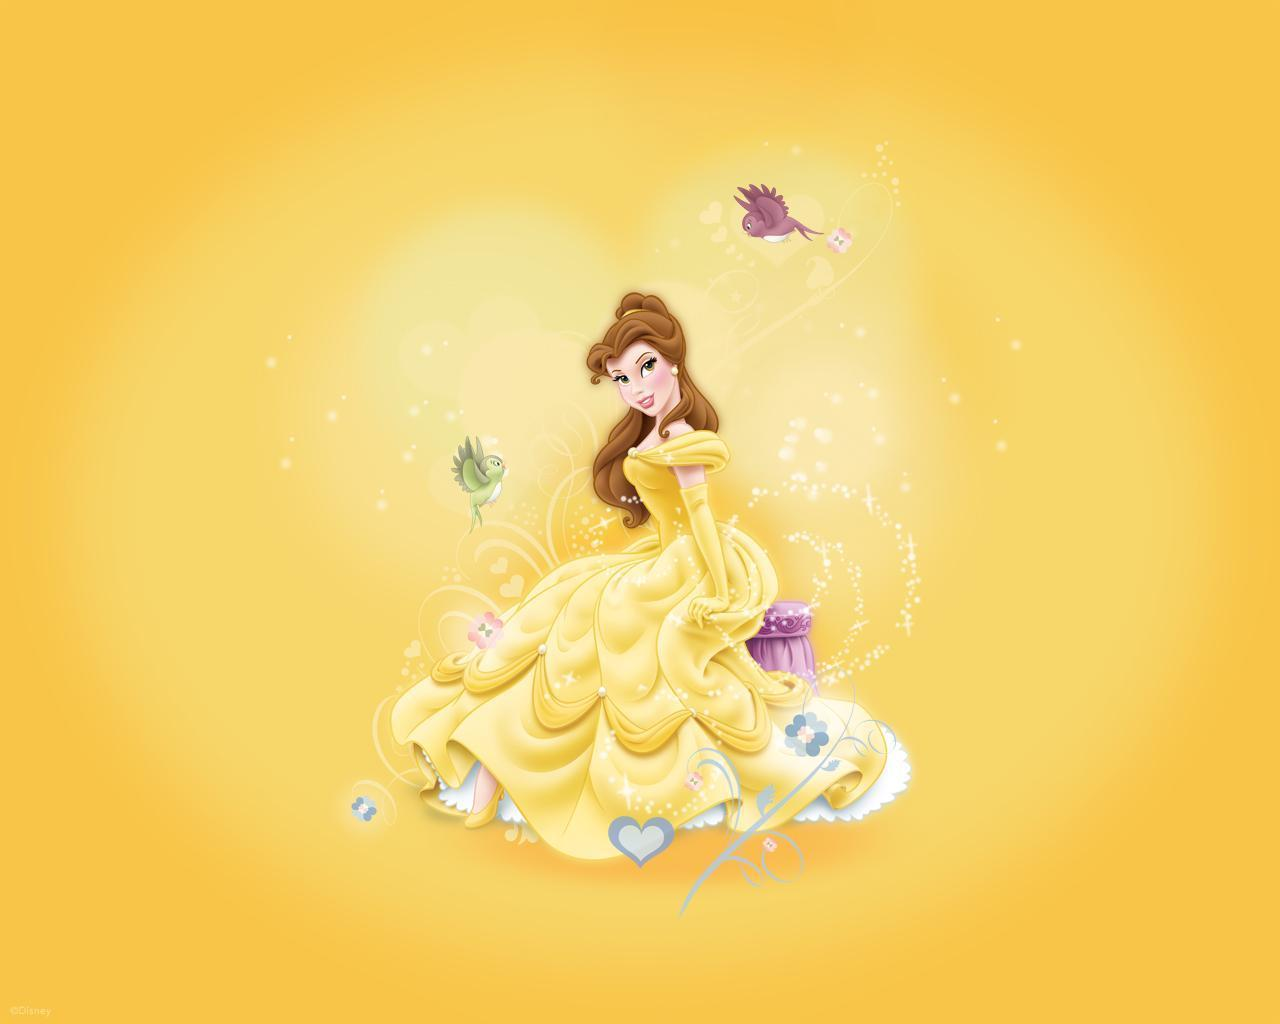 مكتبة ضخمة من صور ورمزيات اميرات ديزني Princess-Belle-disney-princess-7737414-1280-1024